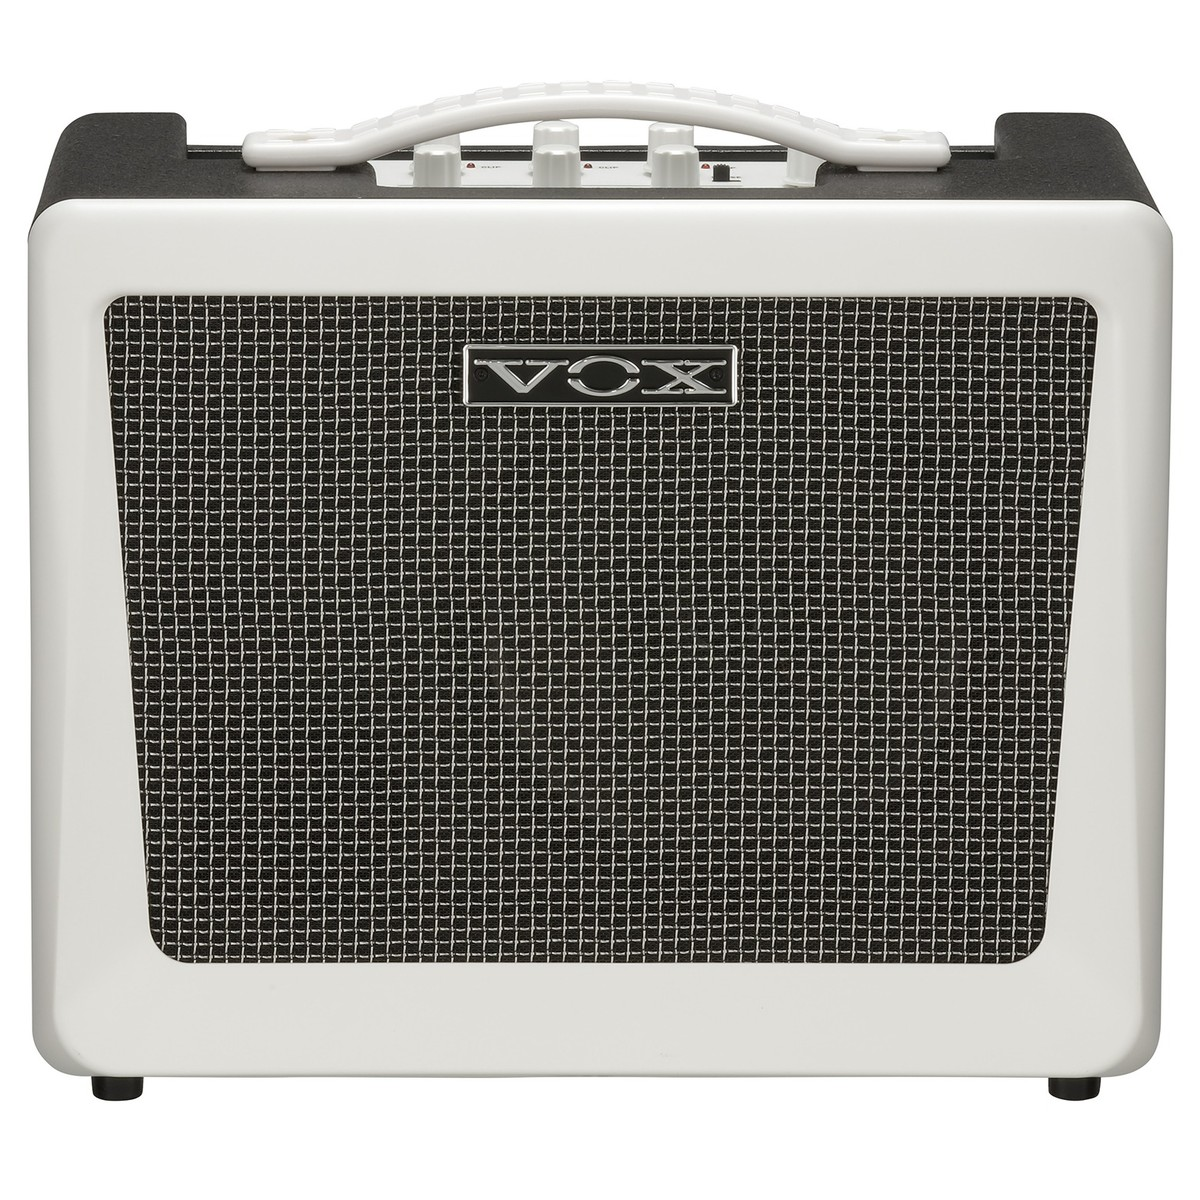 Vox Vx50 Kb Portable Keyboard Amplifier At Gear4music Project 116 Subwoofer Amp